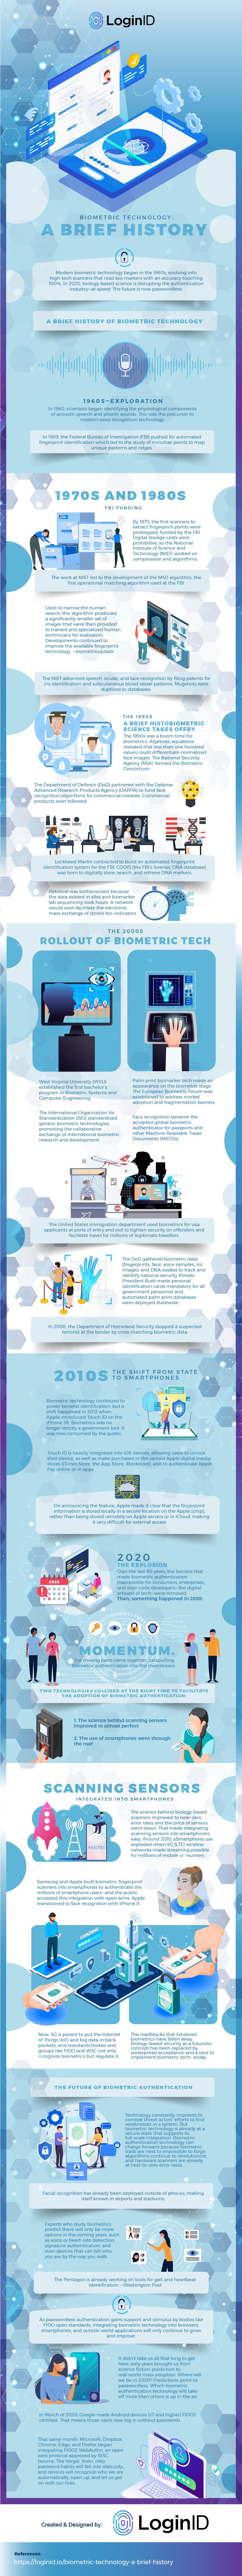 Biometric Technology a brief history32UUWU2